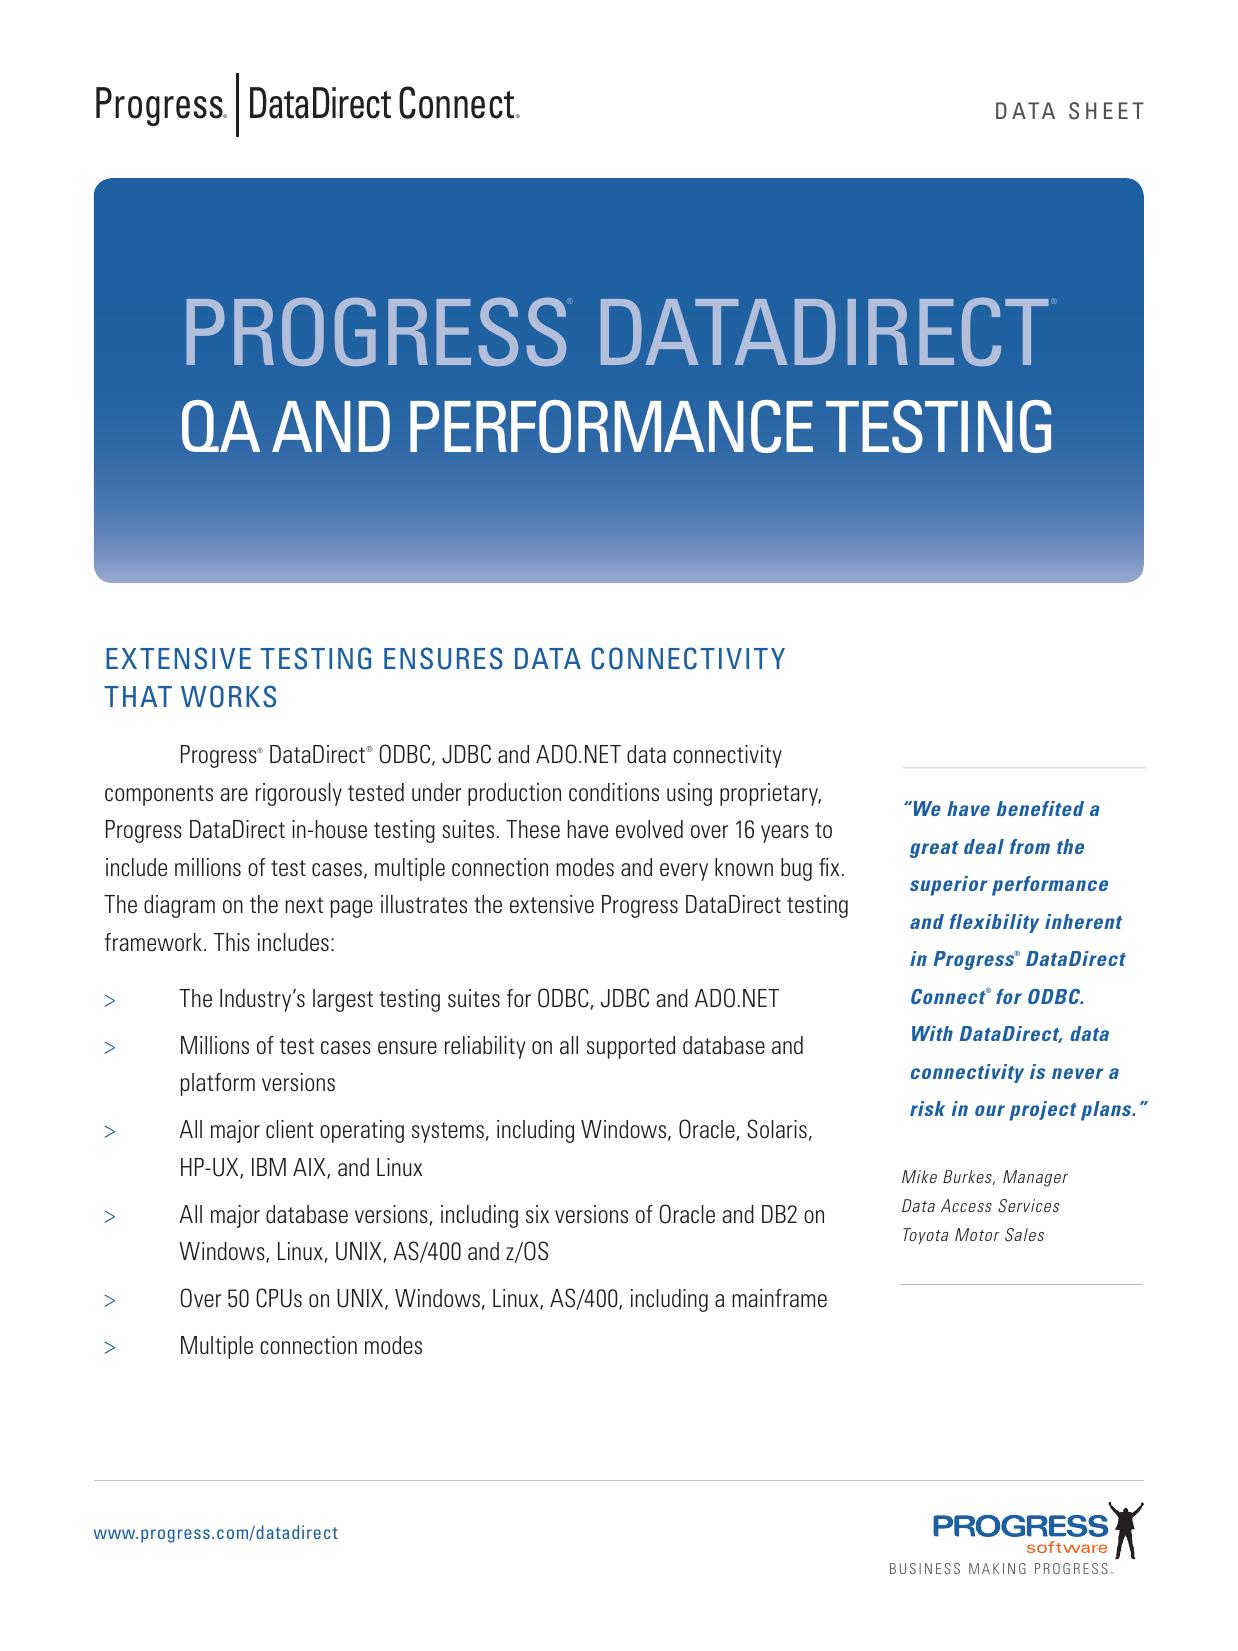 QA and Performance Testing   manualzz com